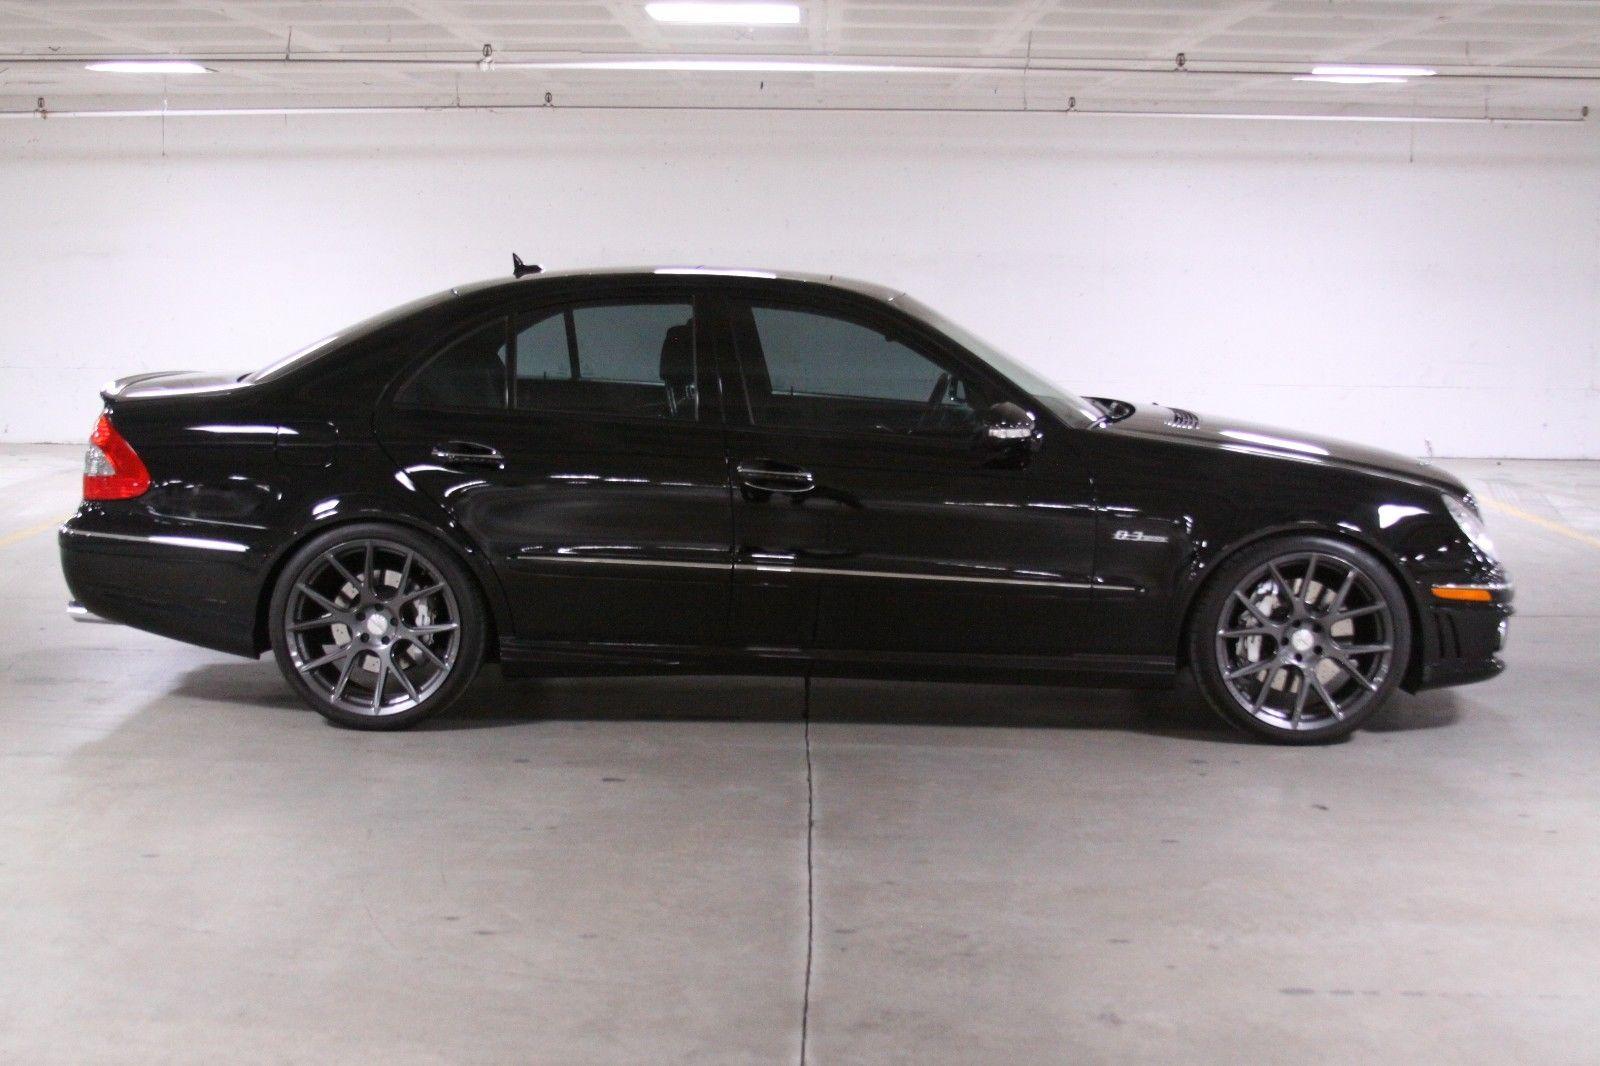 2007 mercedes benz w211 e63 amg on 20 vossen vfs6 wheels. Black Bedroom Furniture Sets. Home Design Ideas